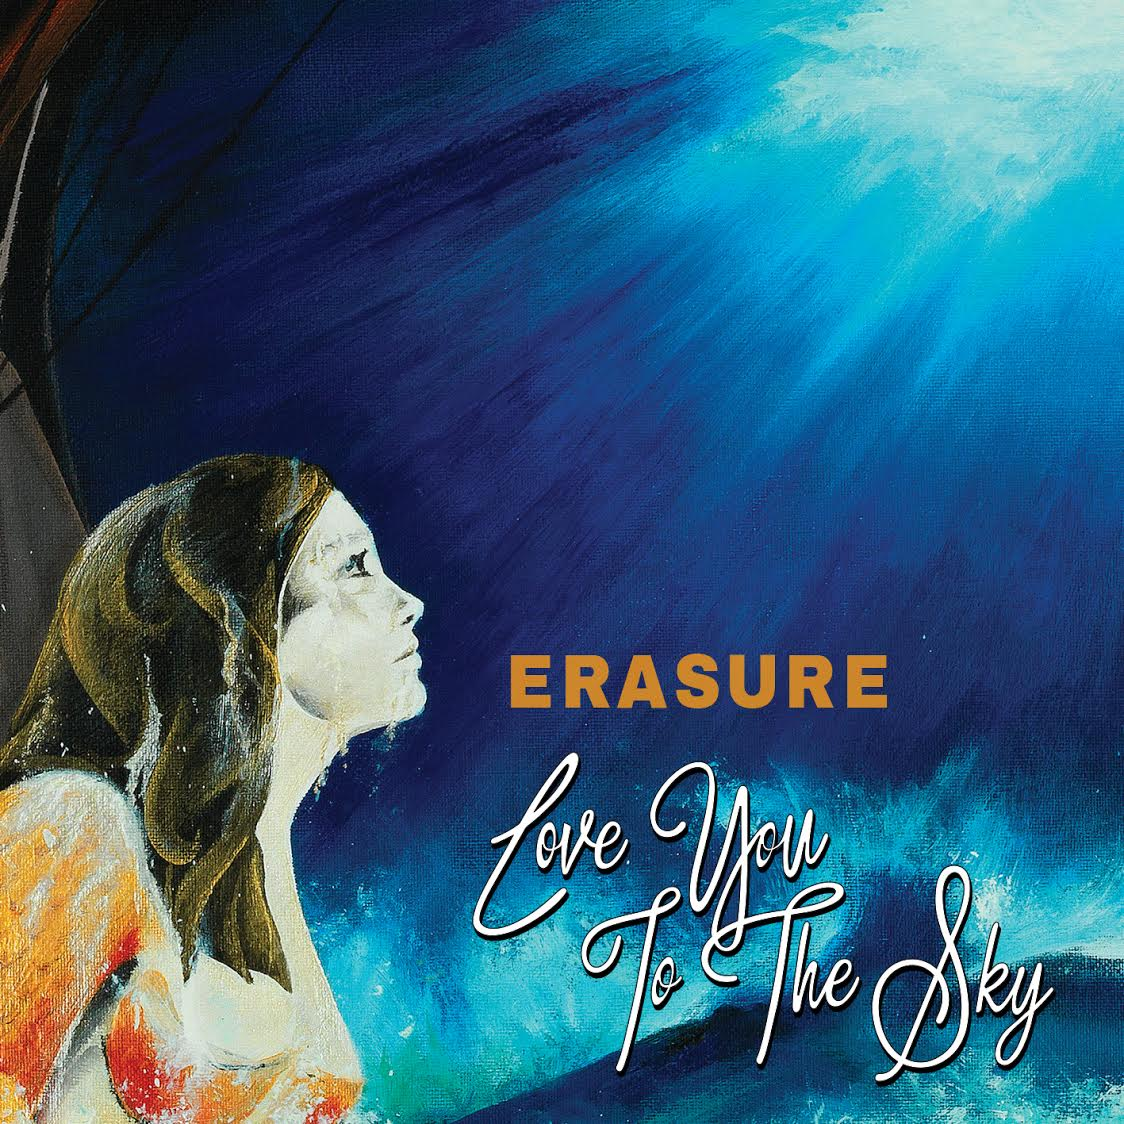 ERASURE - Love You To The Sky EP